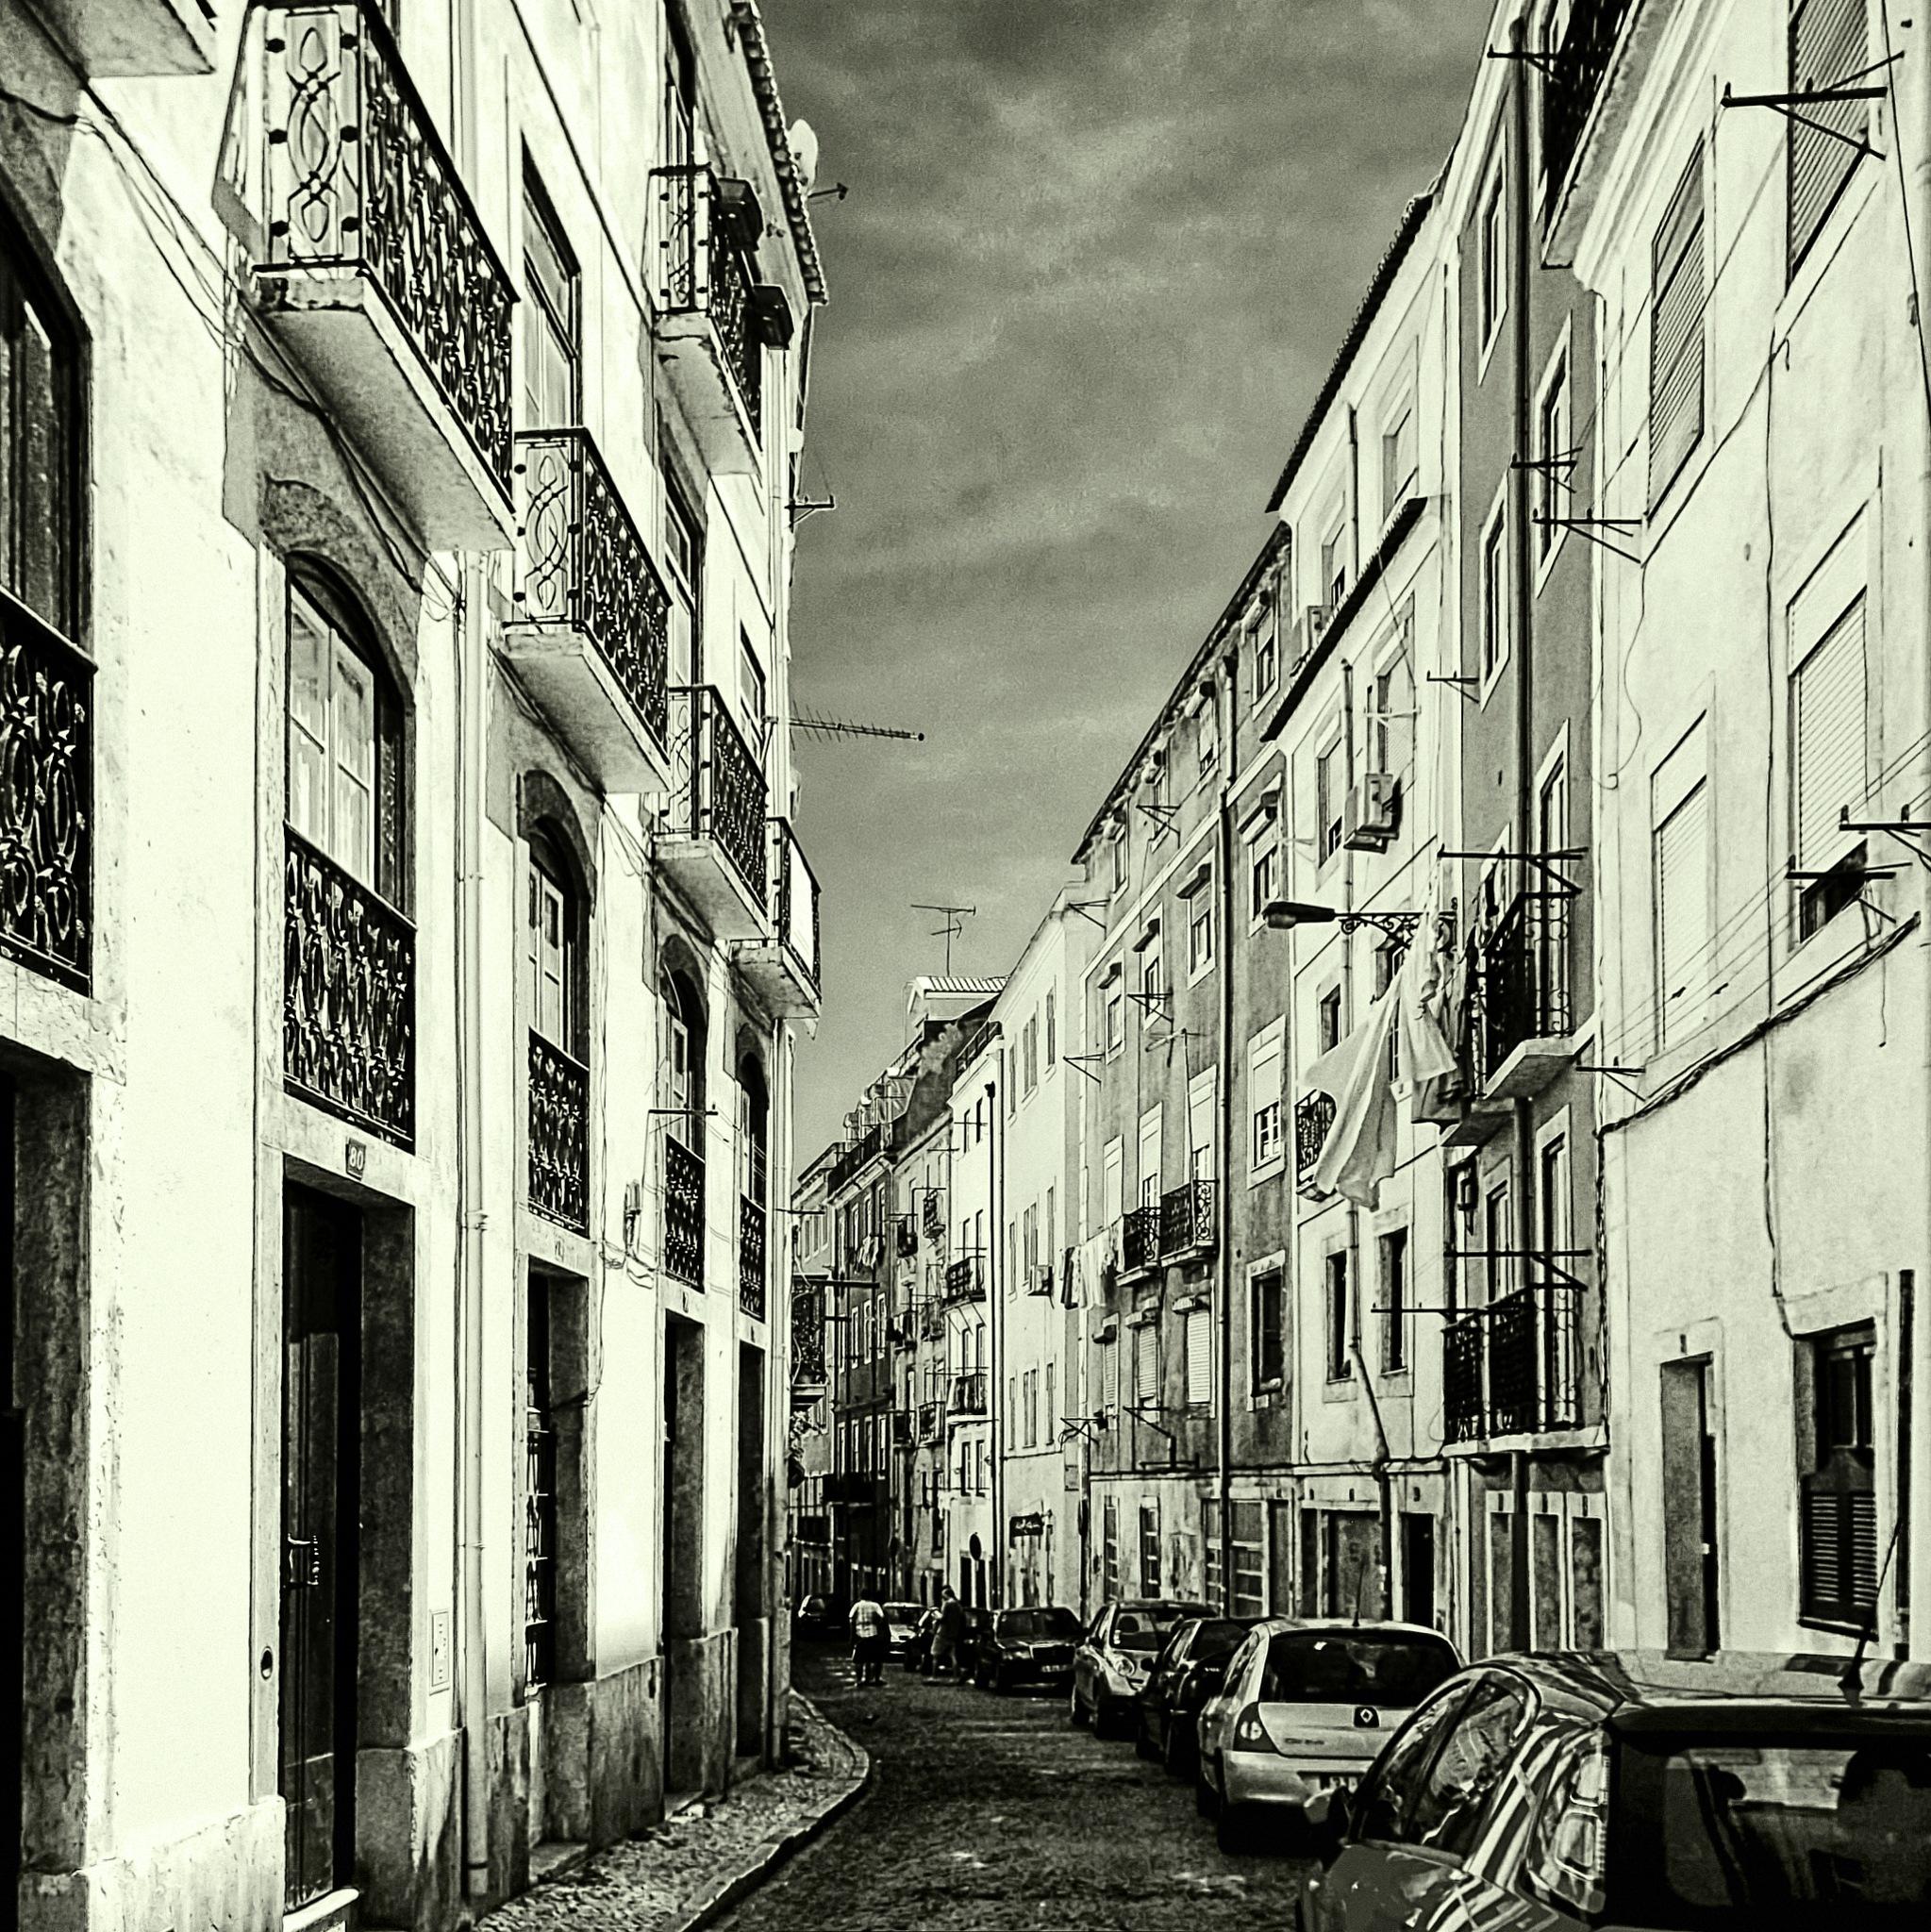 A Lisbon street (Walking around) by JuanM